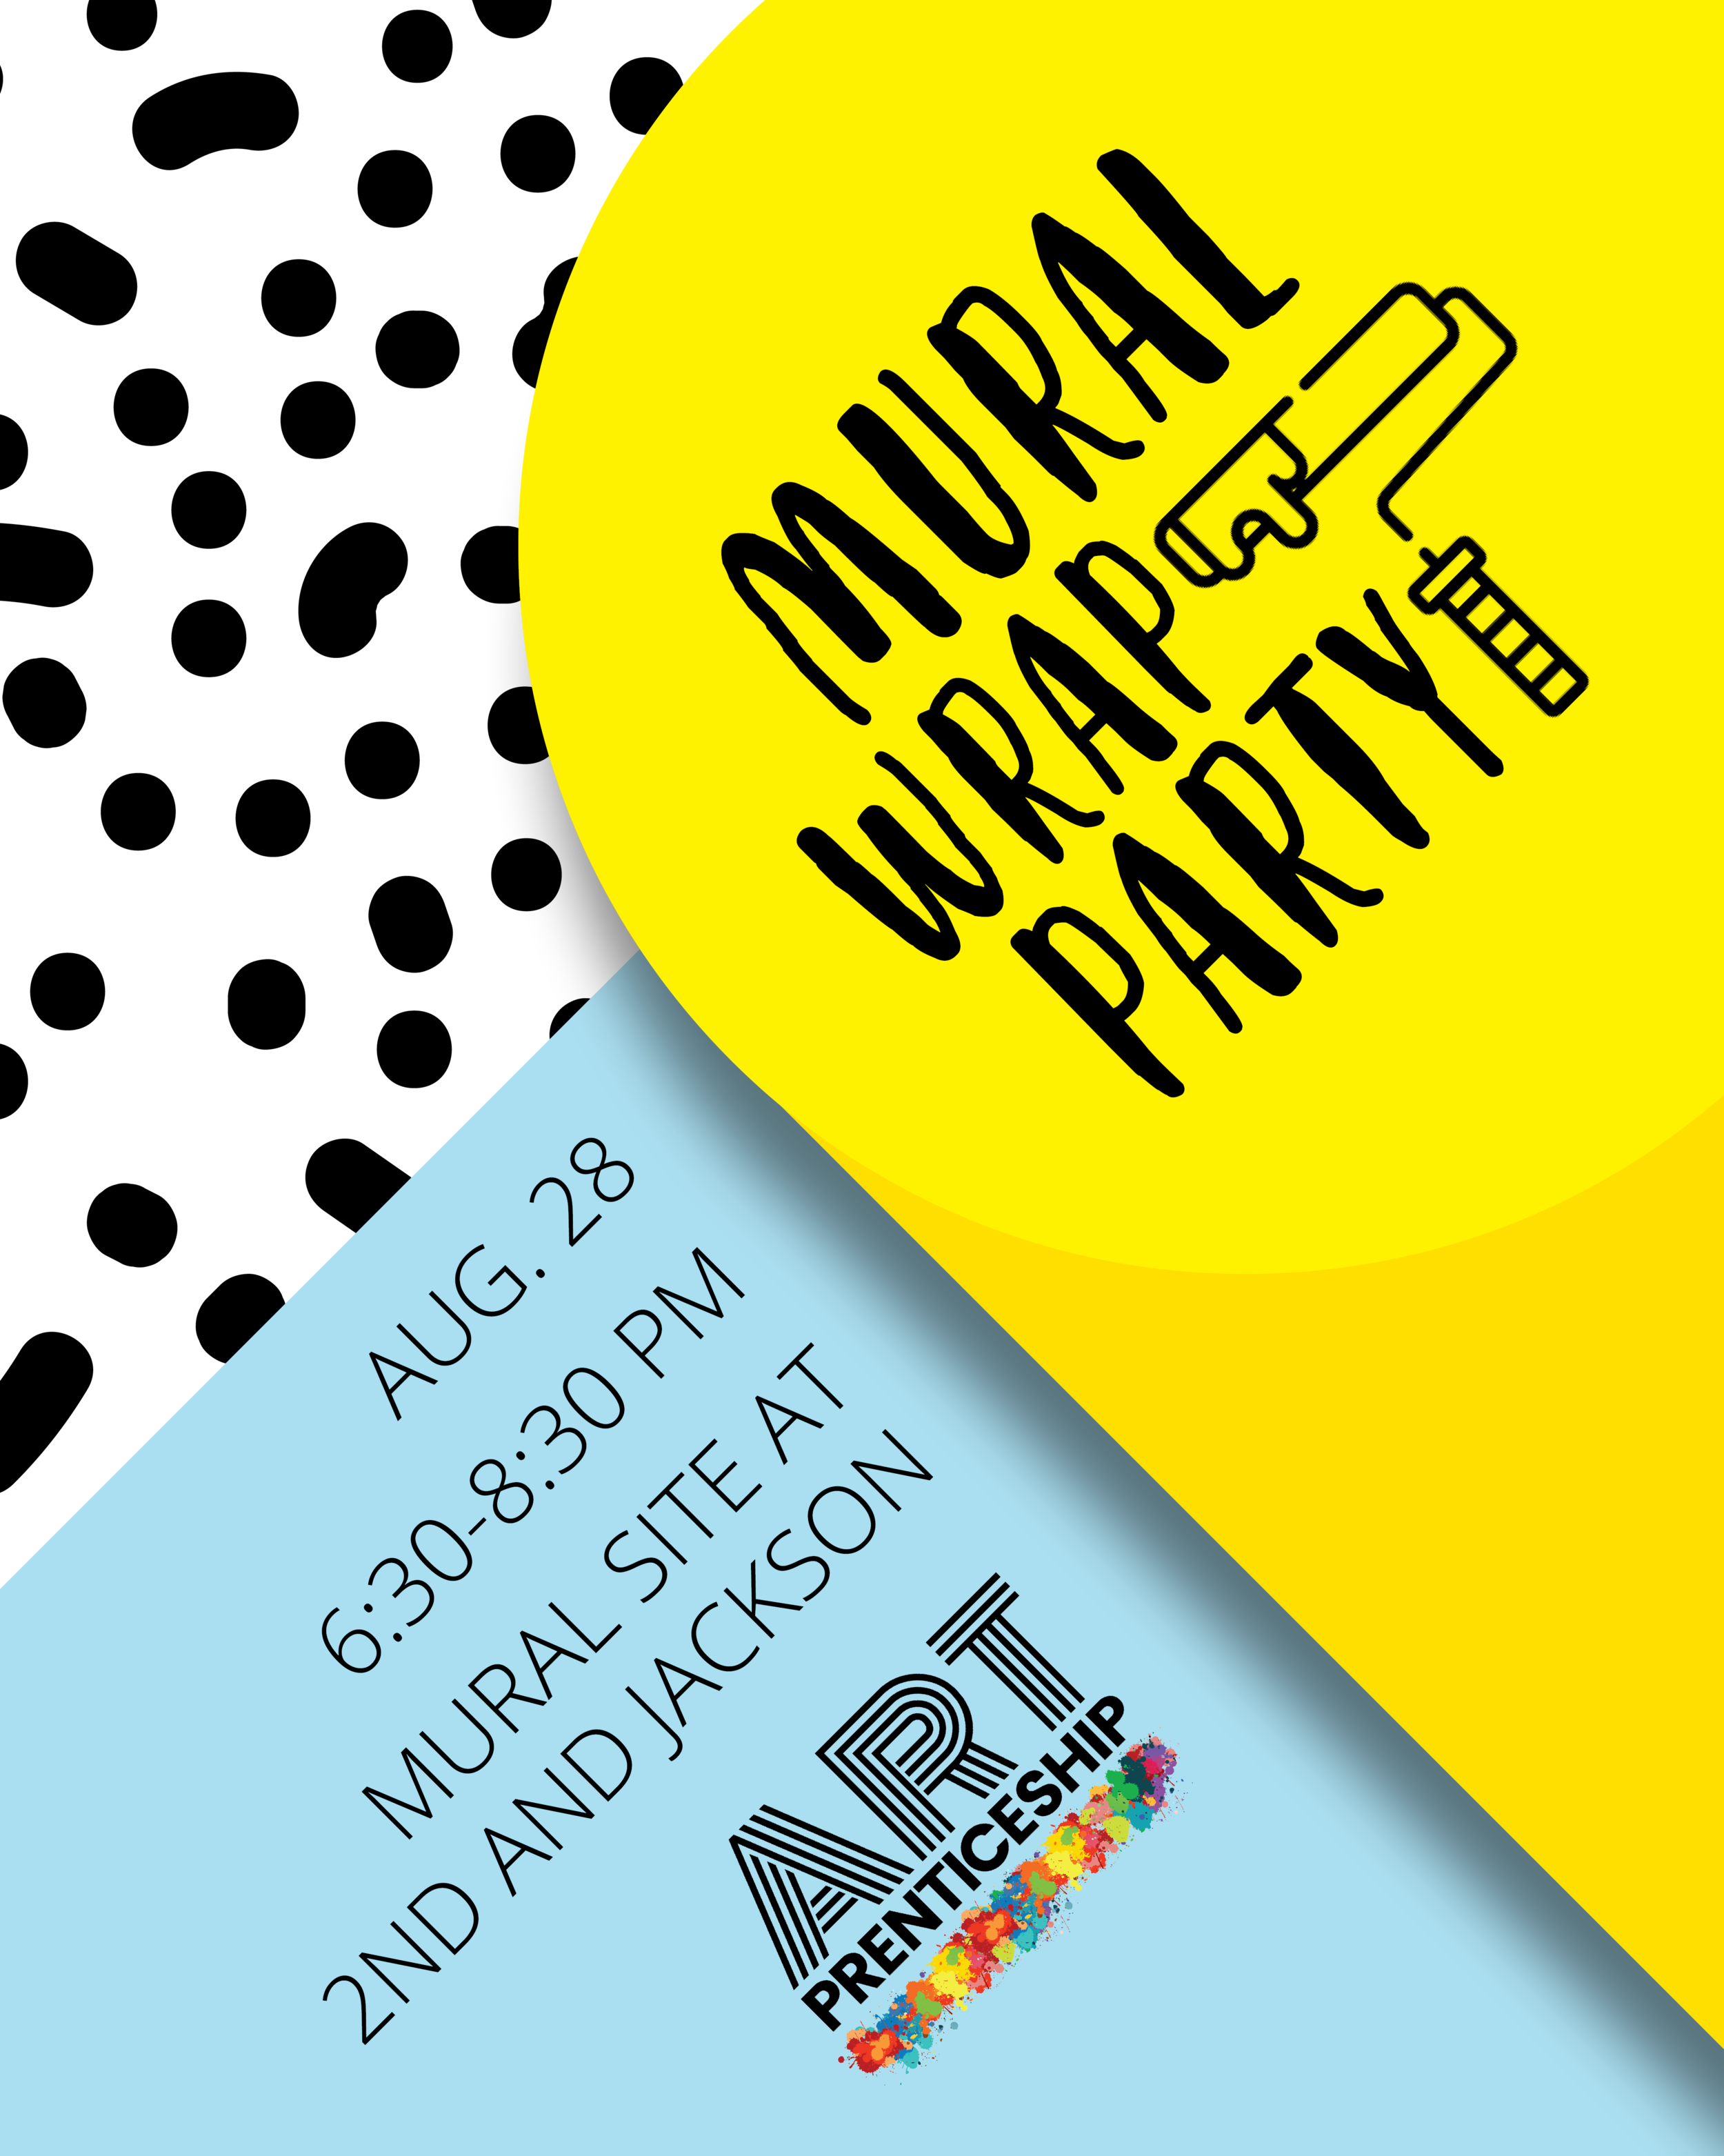 Wrap Party - social media post.png